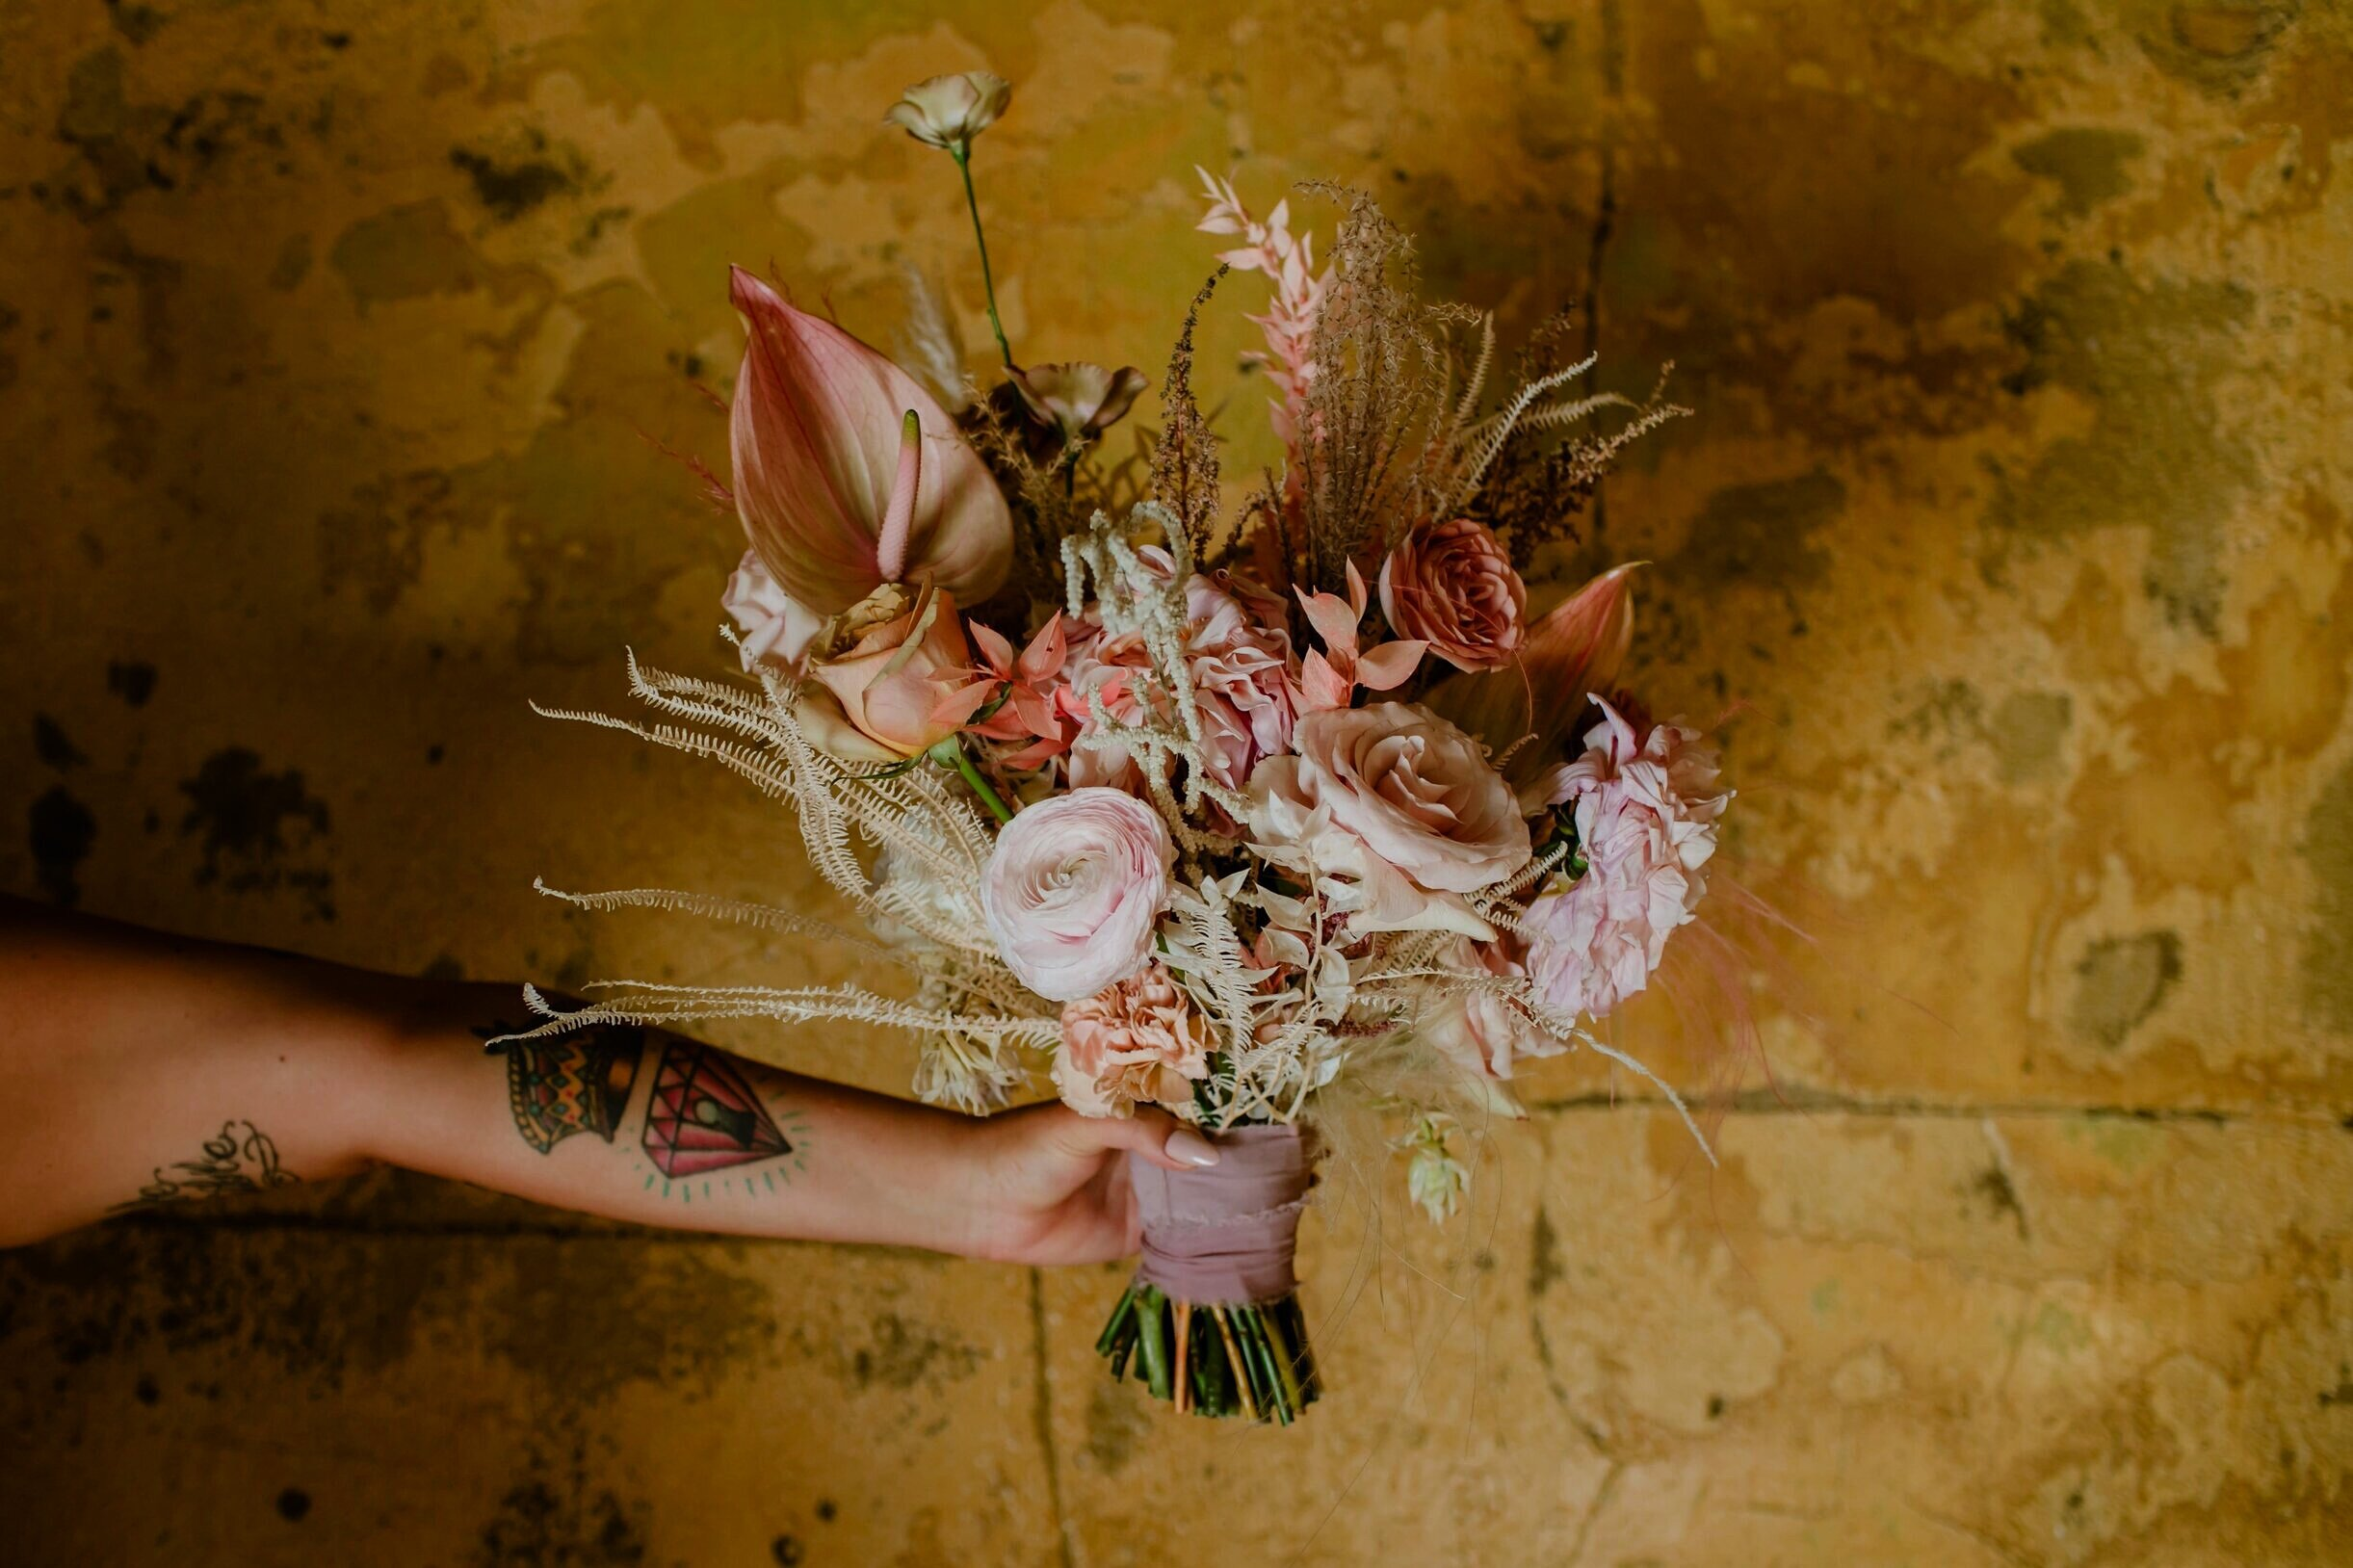 Jenna and Jay Wedding - Eve Rox Photography-5.jpg